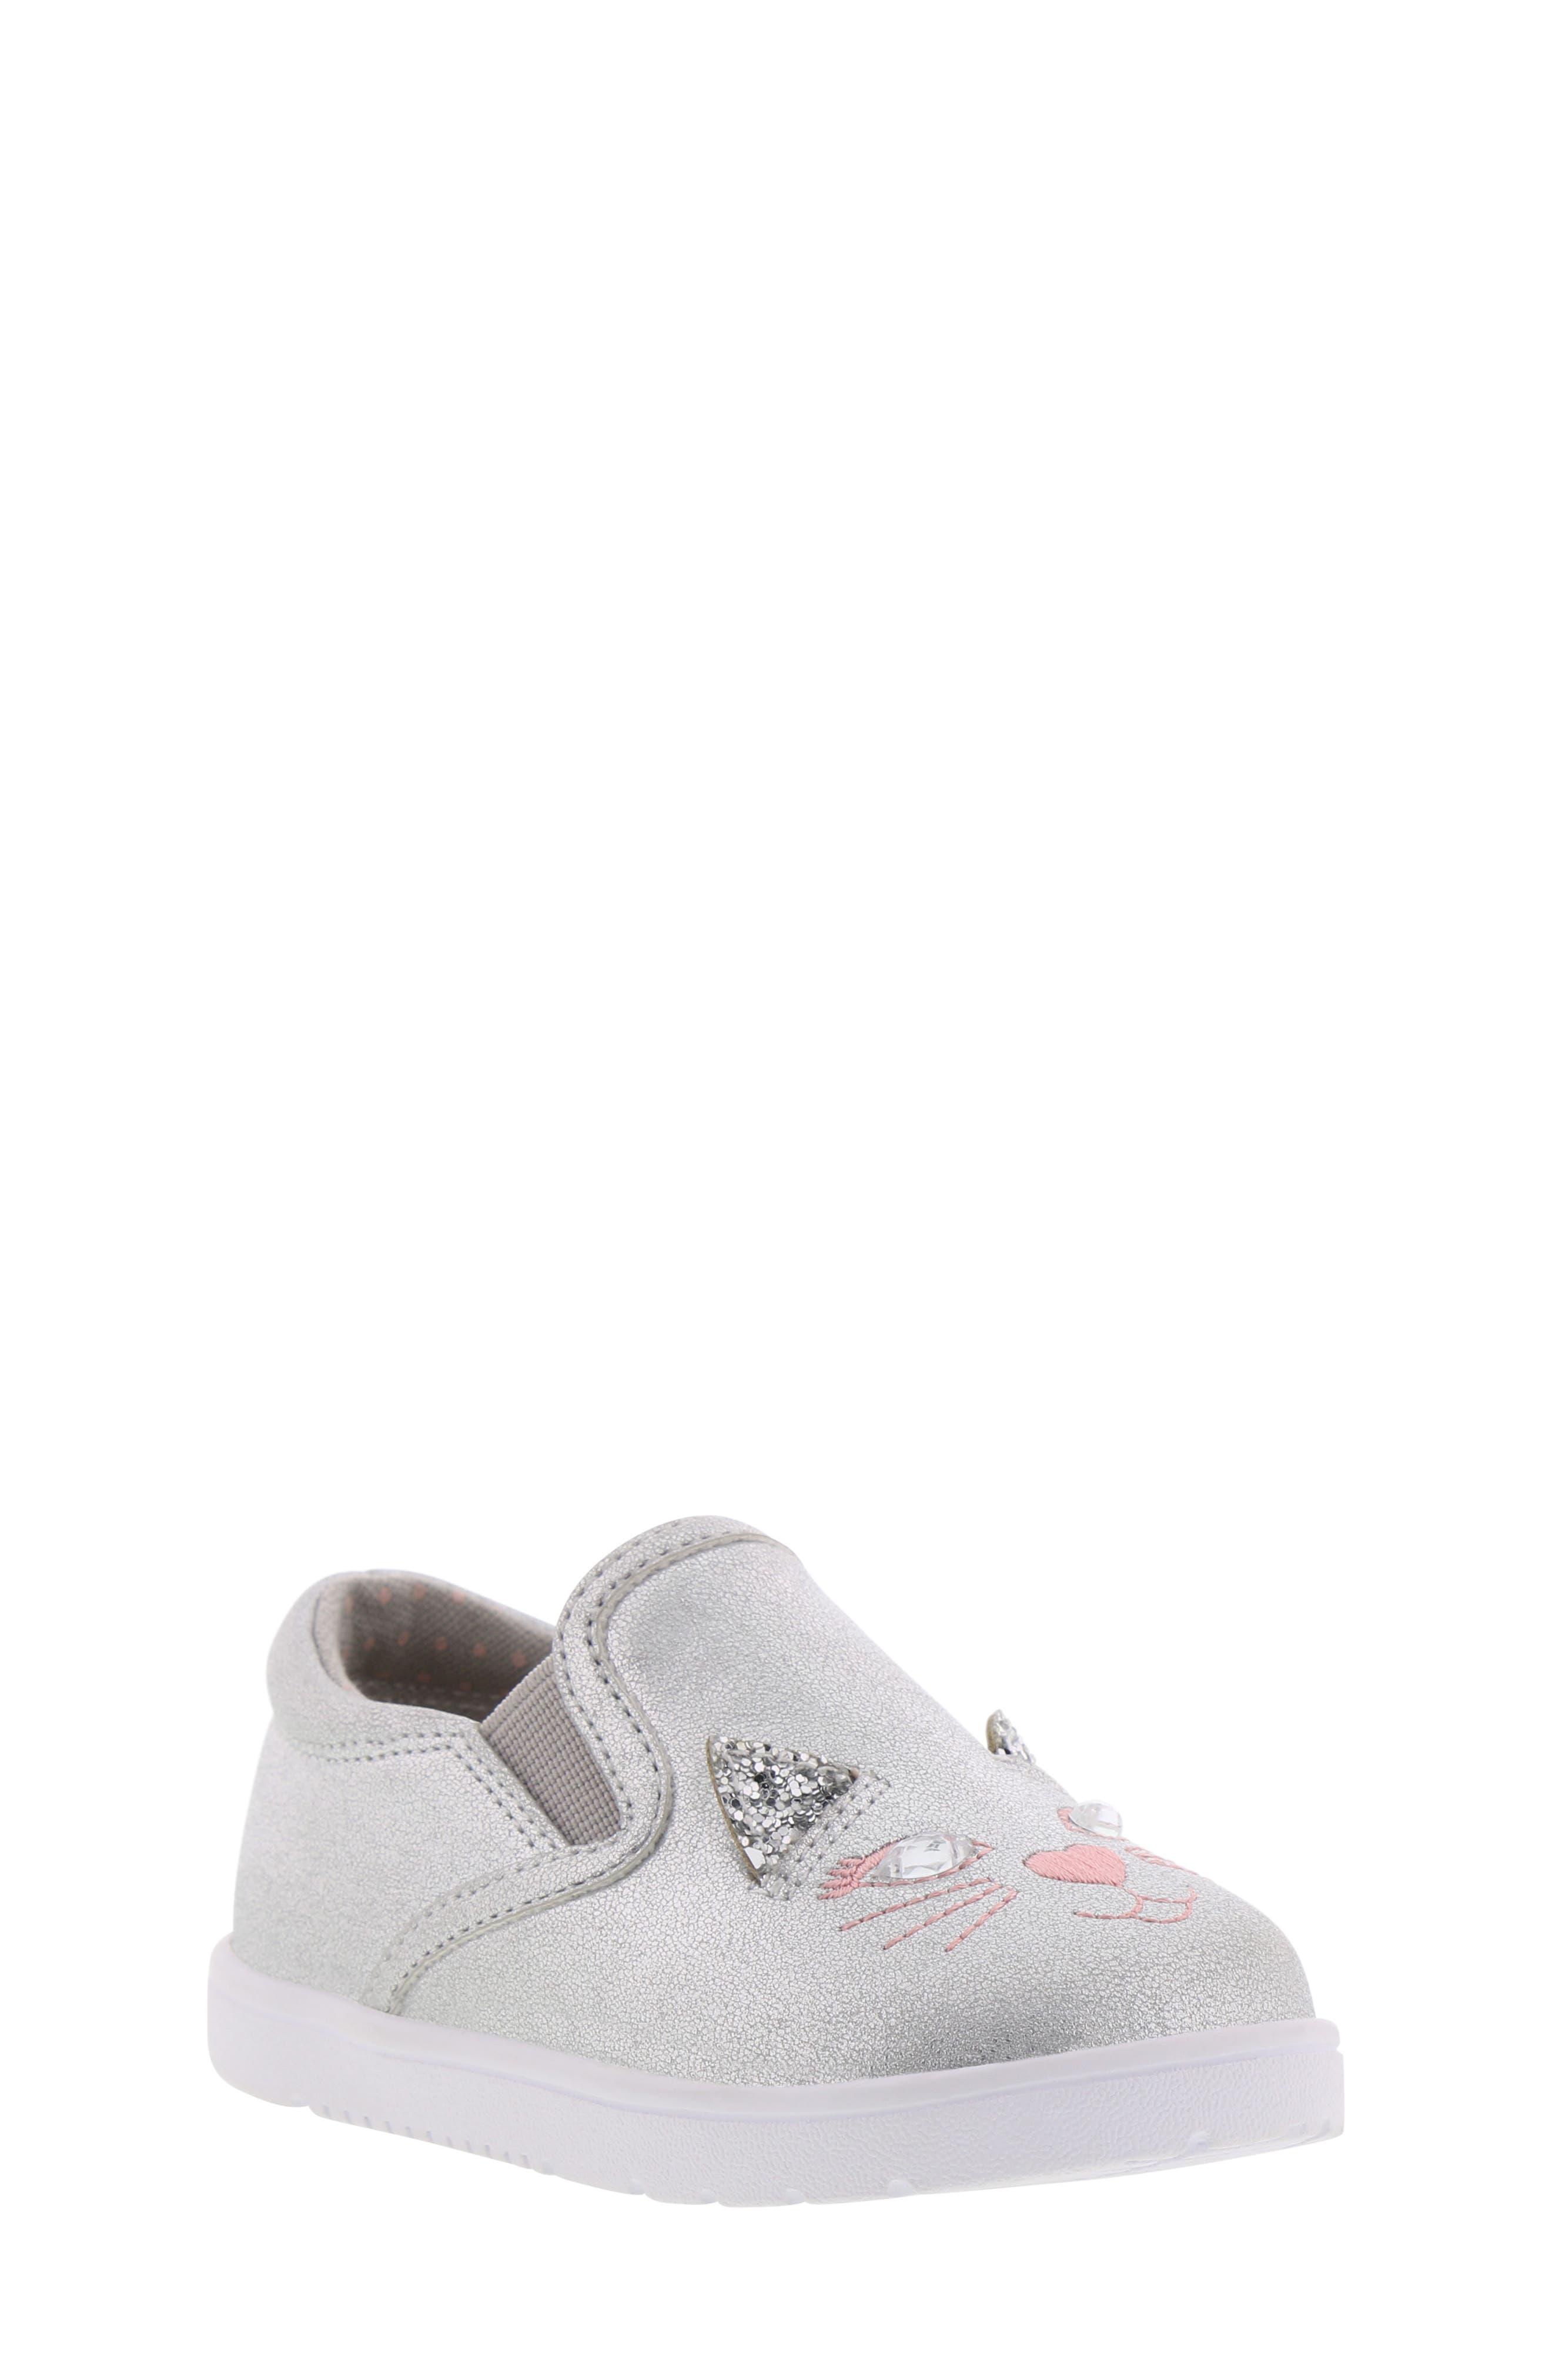 BØRN, Bailey Jaslyna Slip-On Glitter Sneaker, Main thumbnail 1, color, SILVER